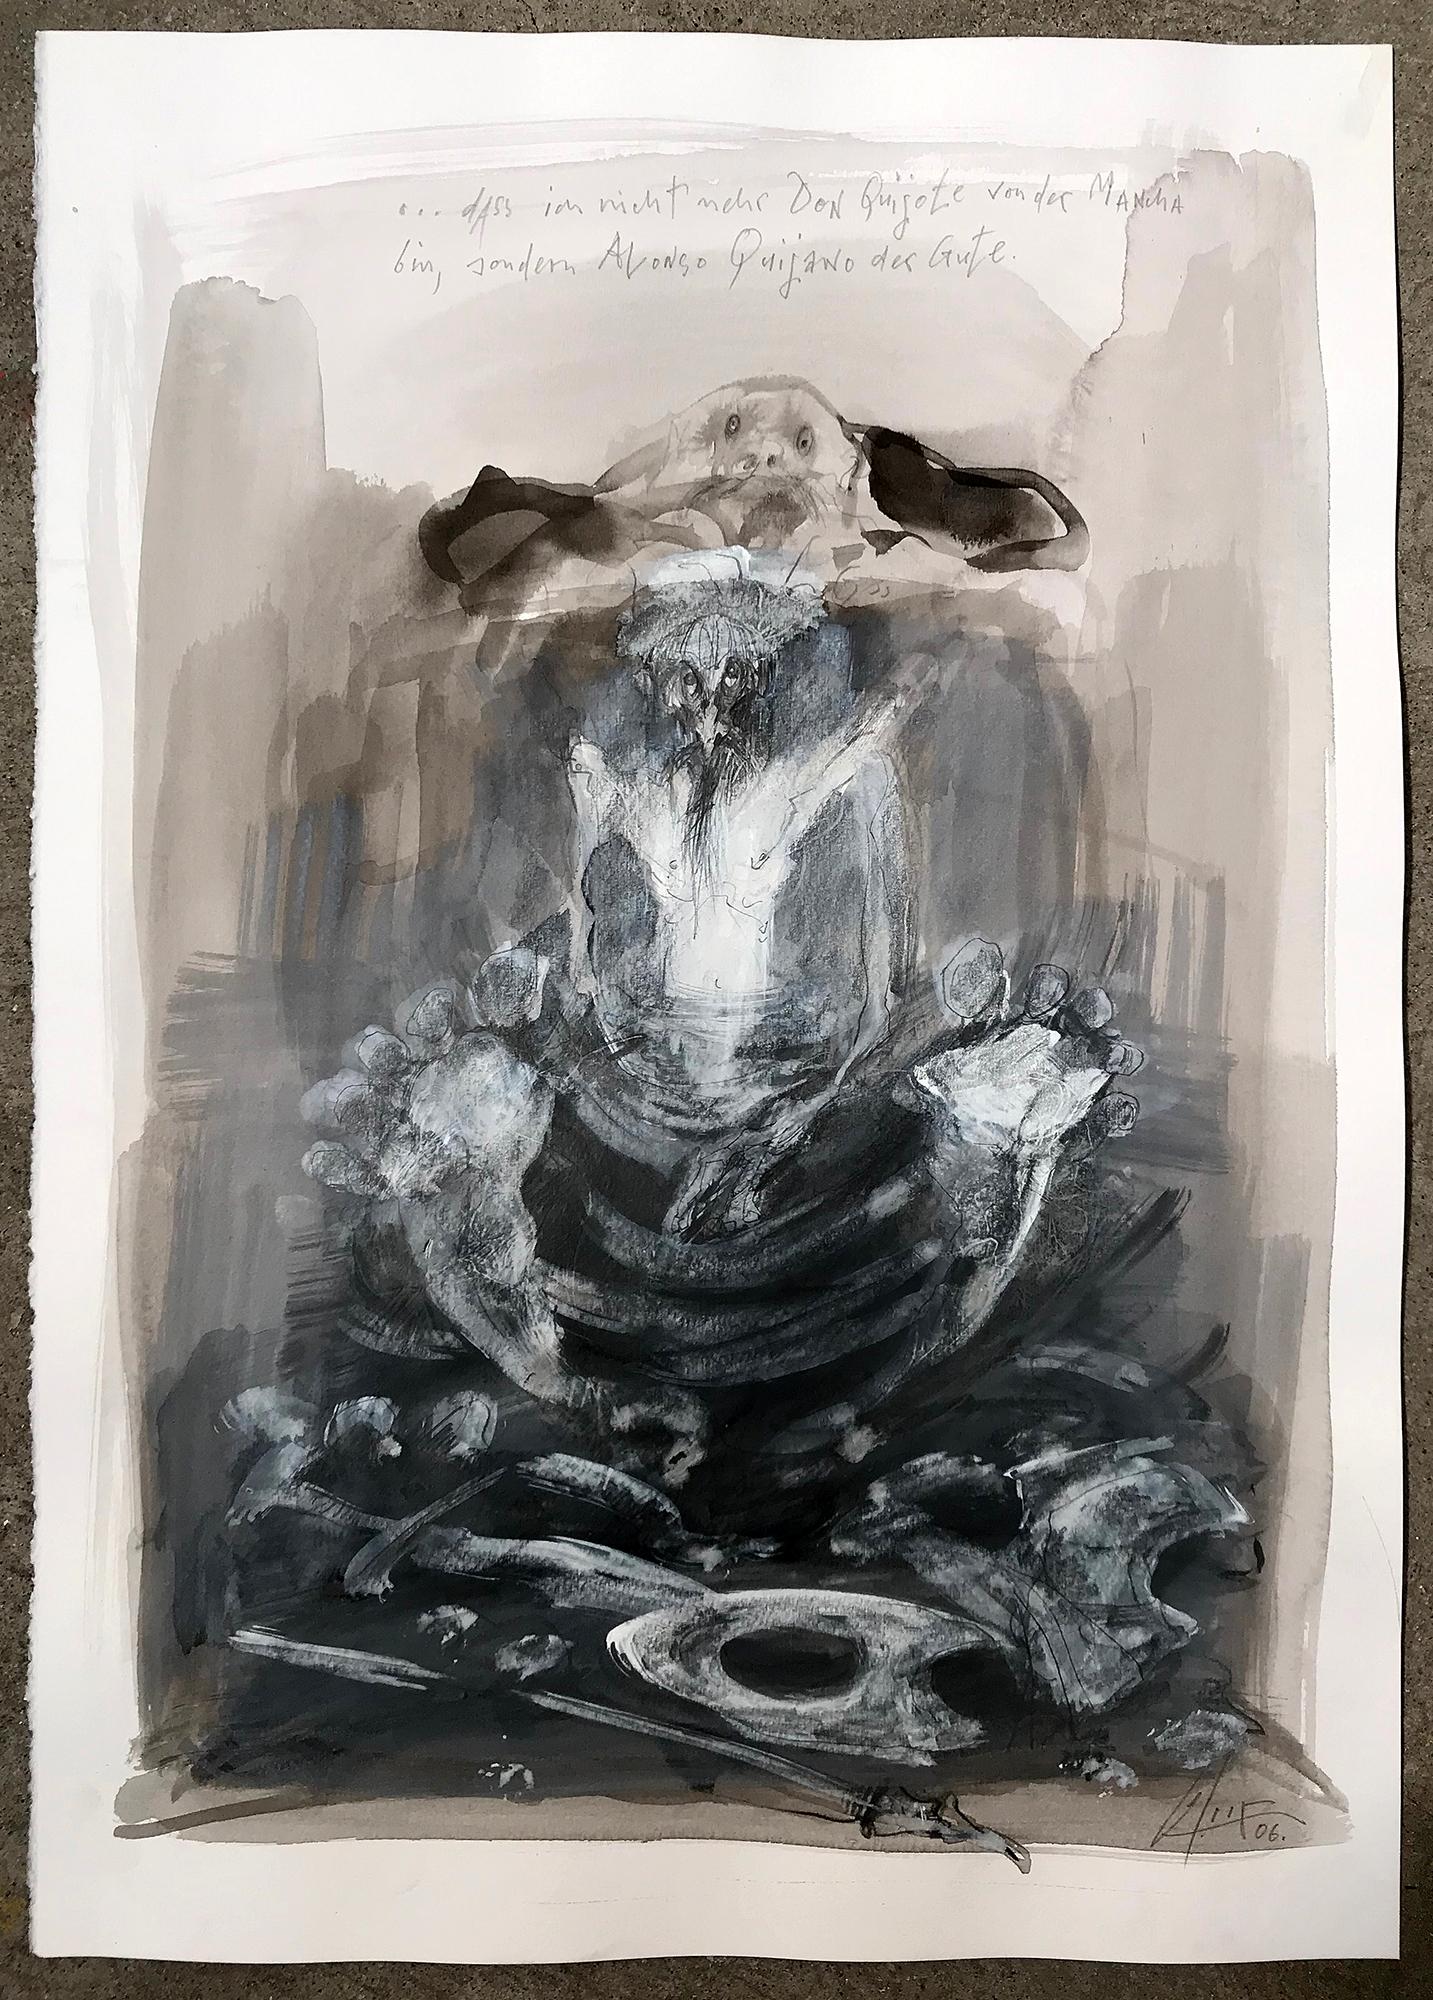 Don Quichot, Alonso Quijano, 2006, Mischtechnik auf Büttenpapier, 36 x 49 cm, ohne Rahmen